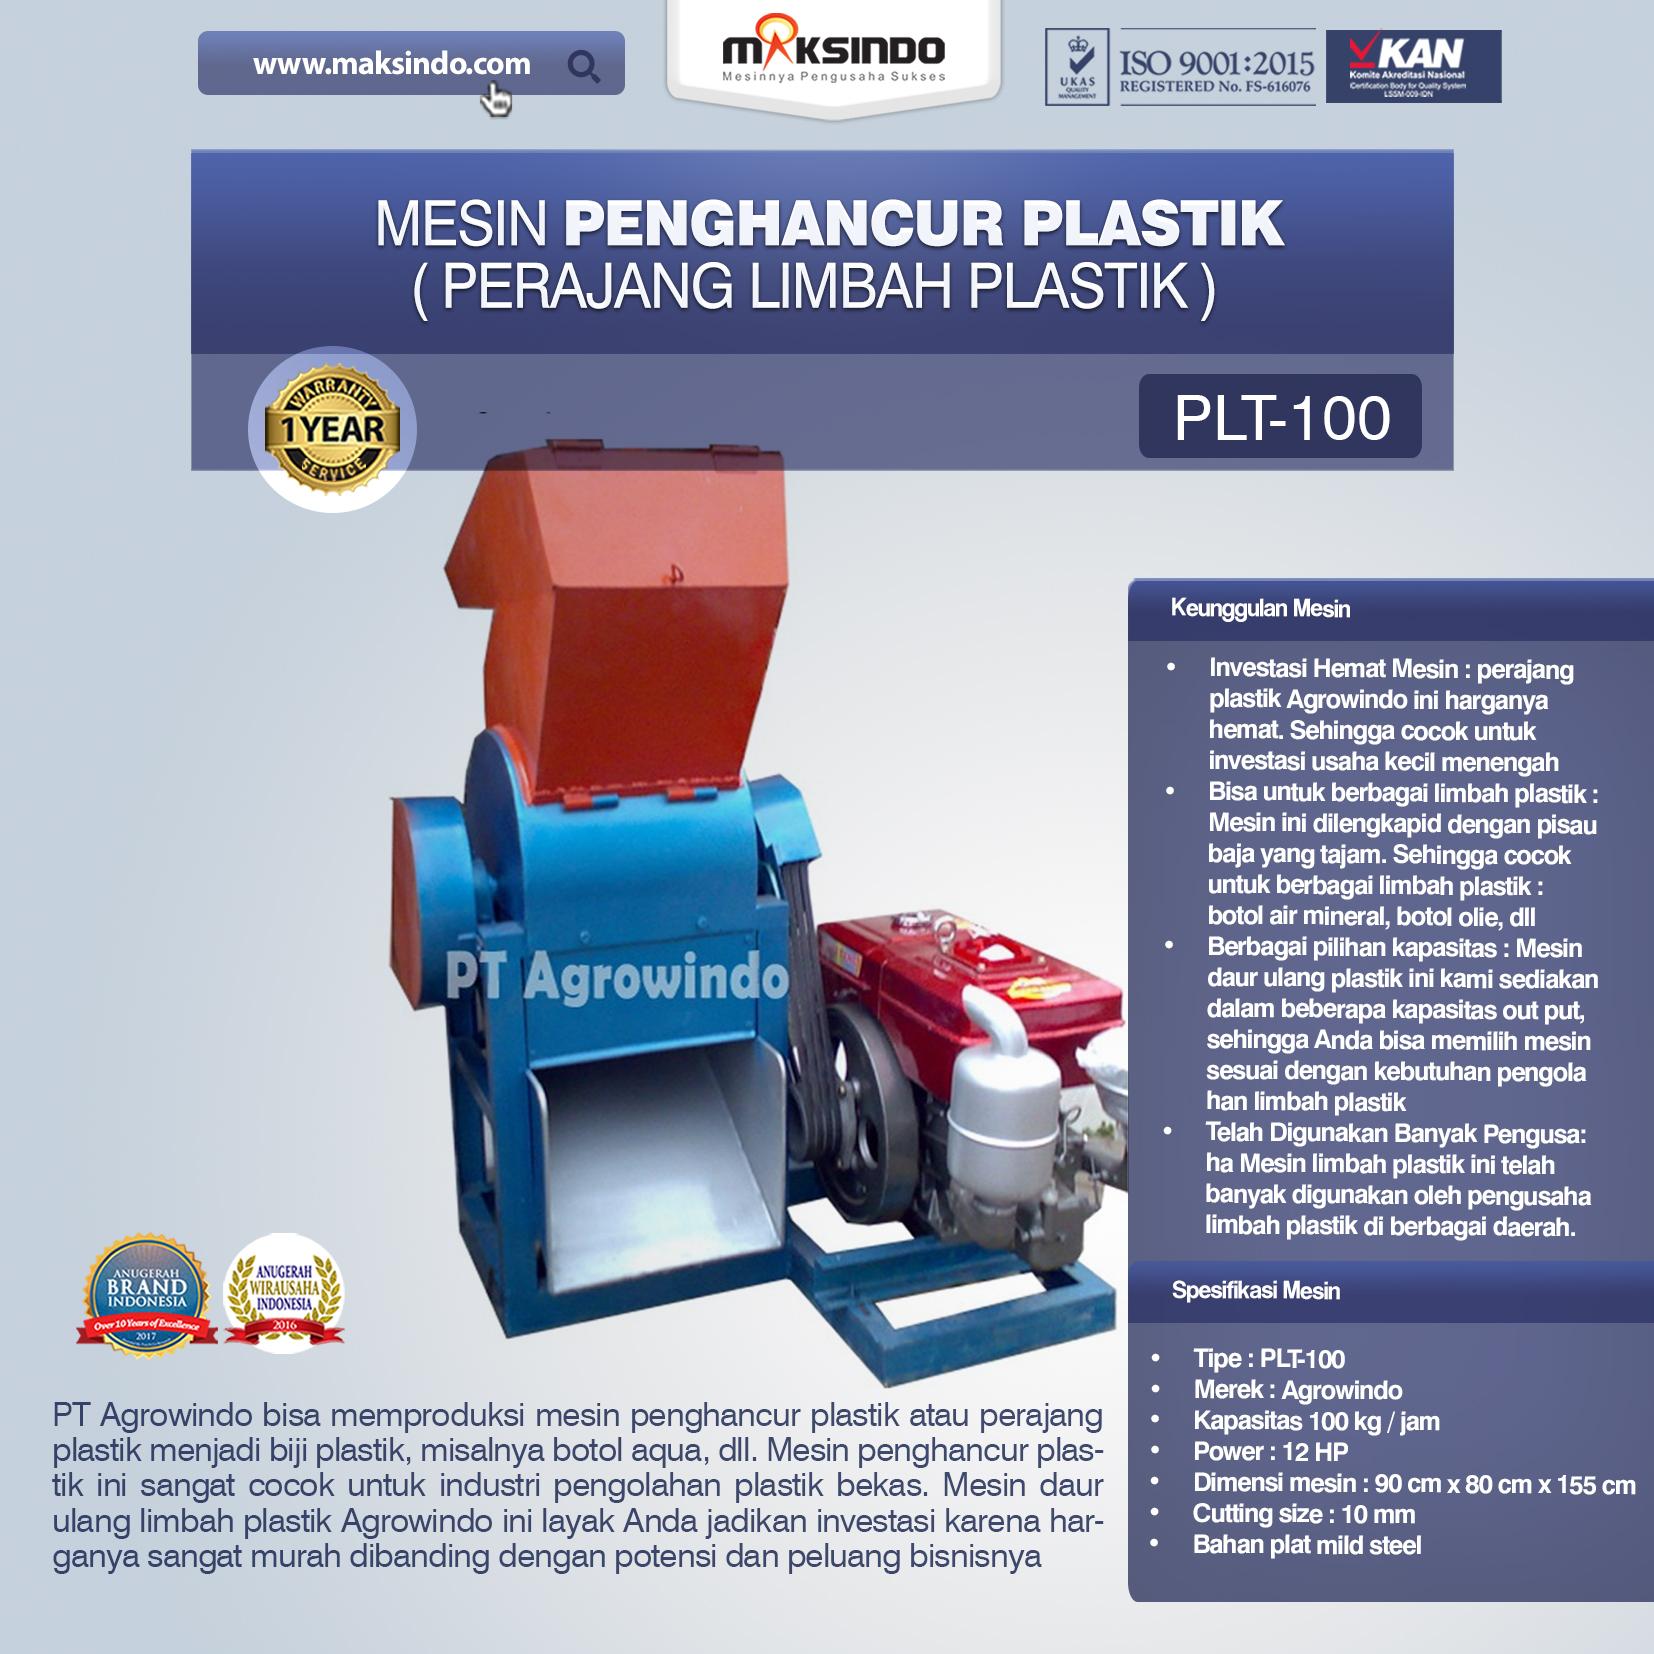 mesin penghancur plastik PLT-100